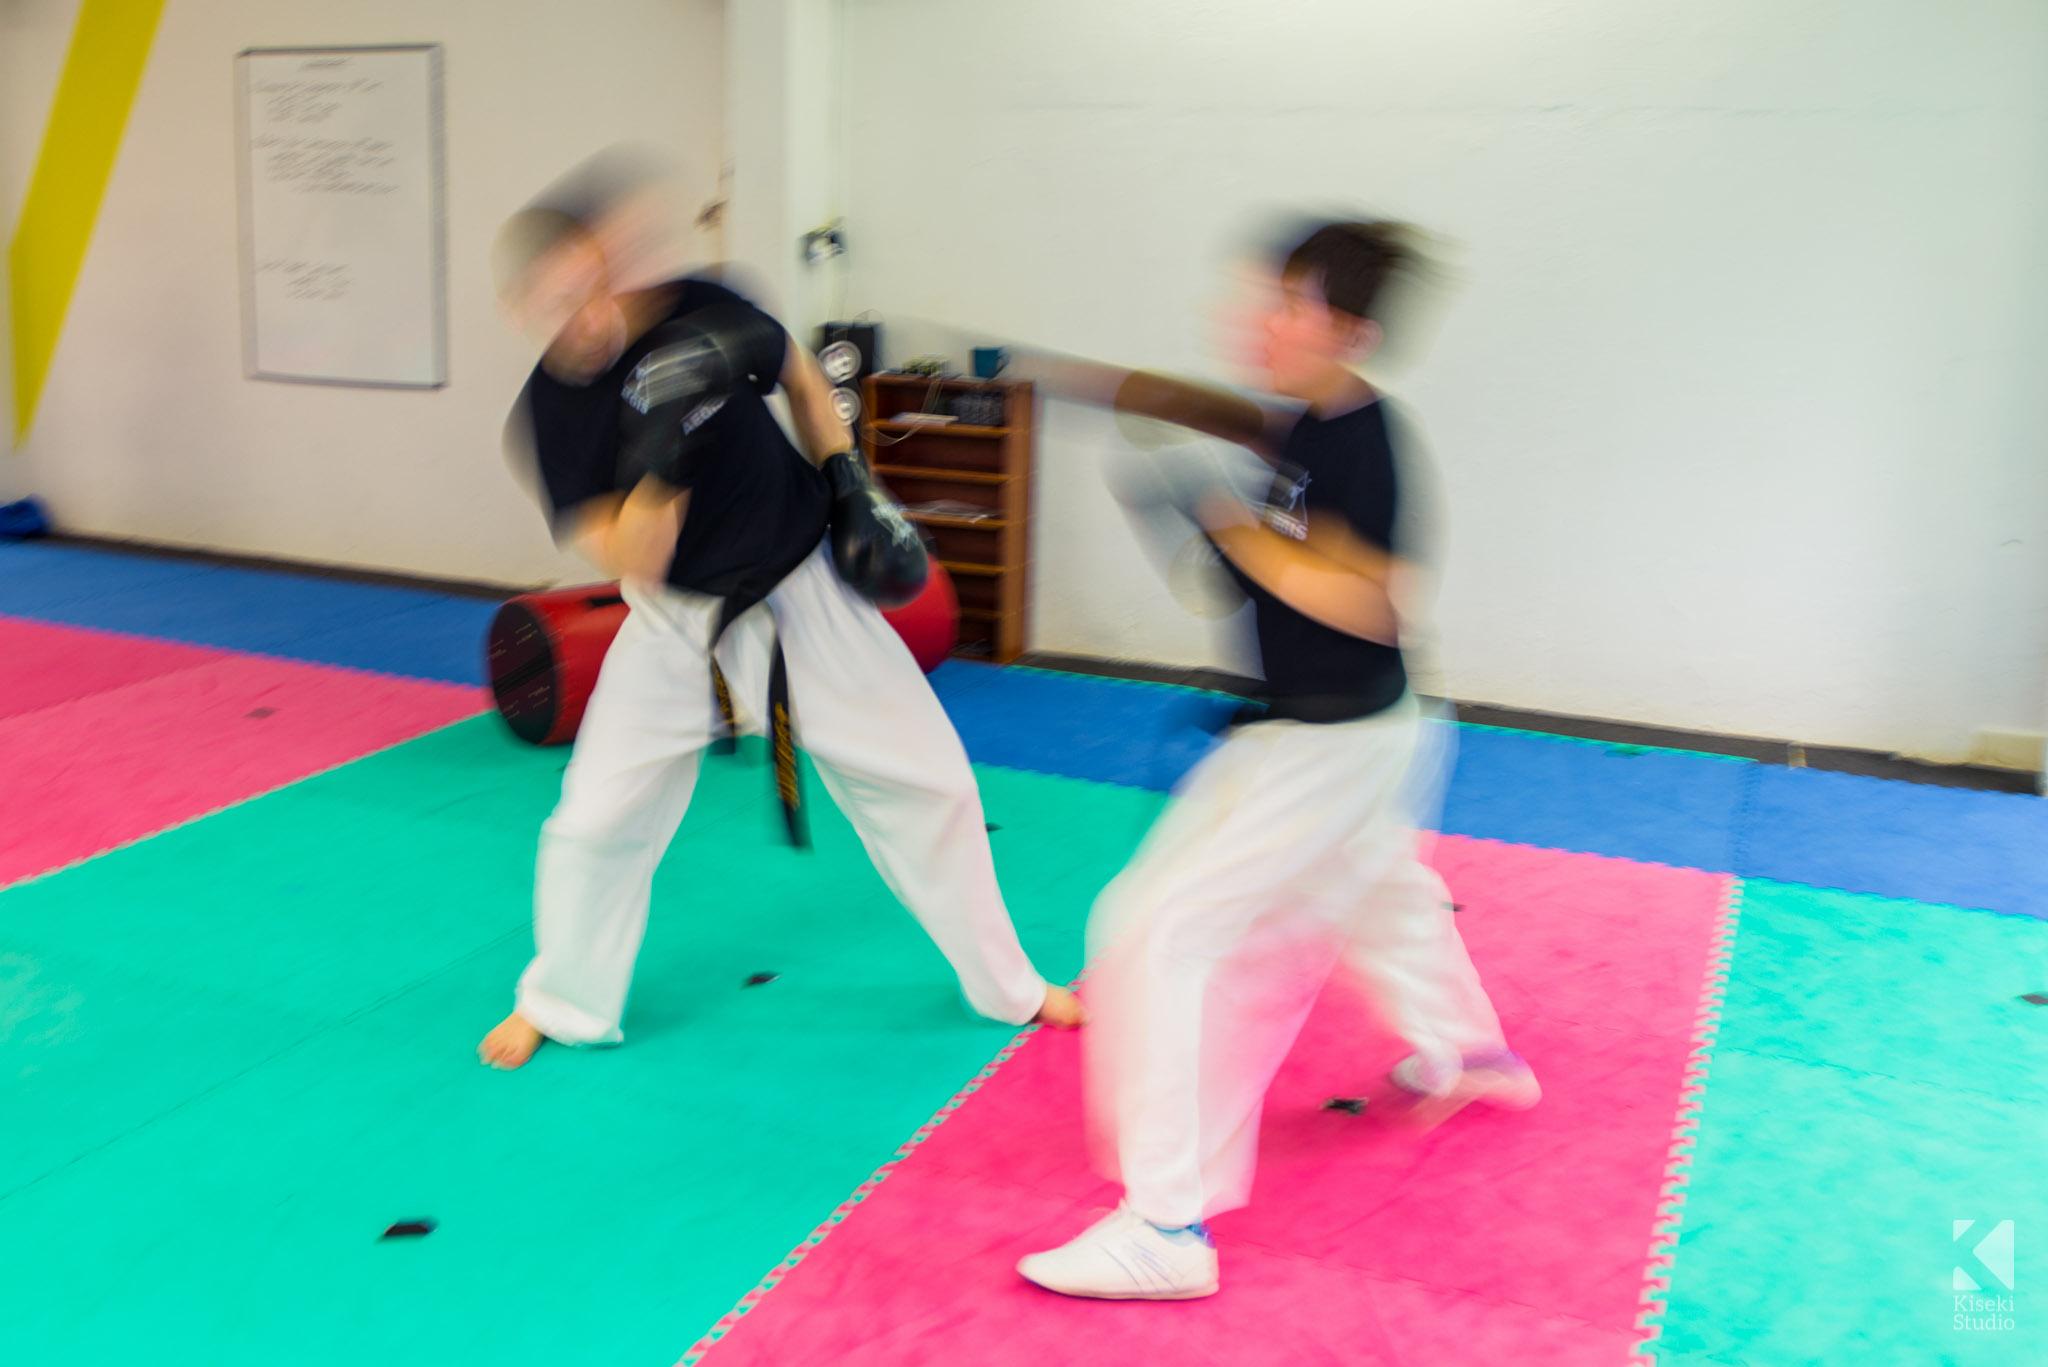 aegis-martial-arts-class-leeds-sparring